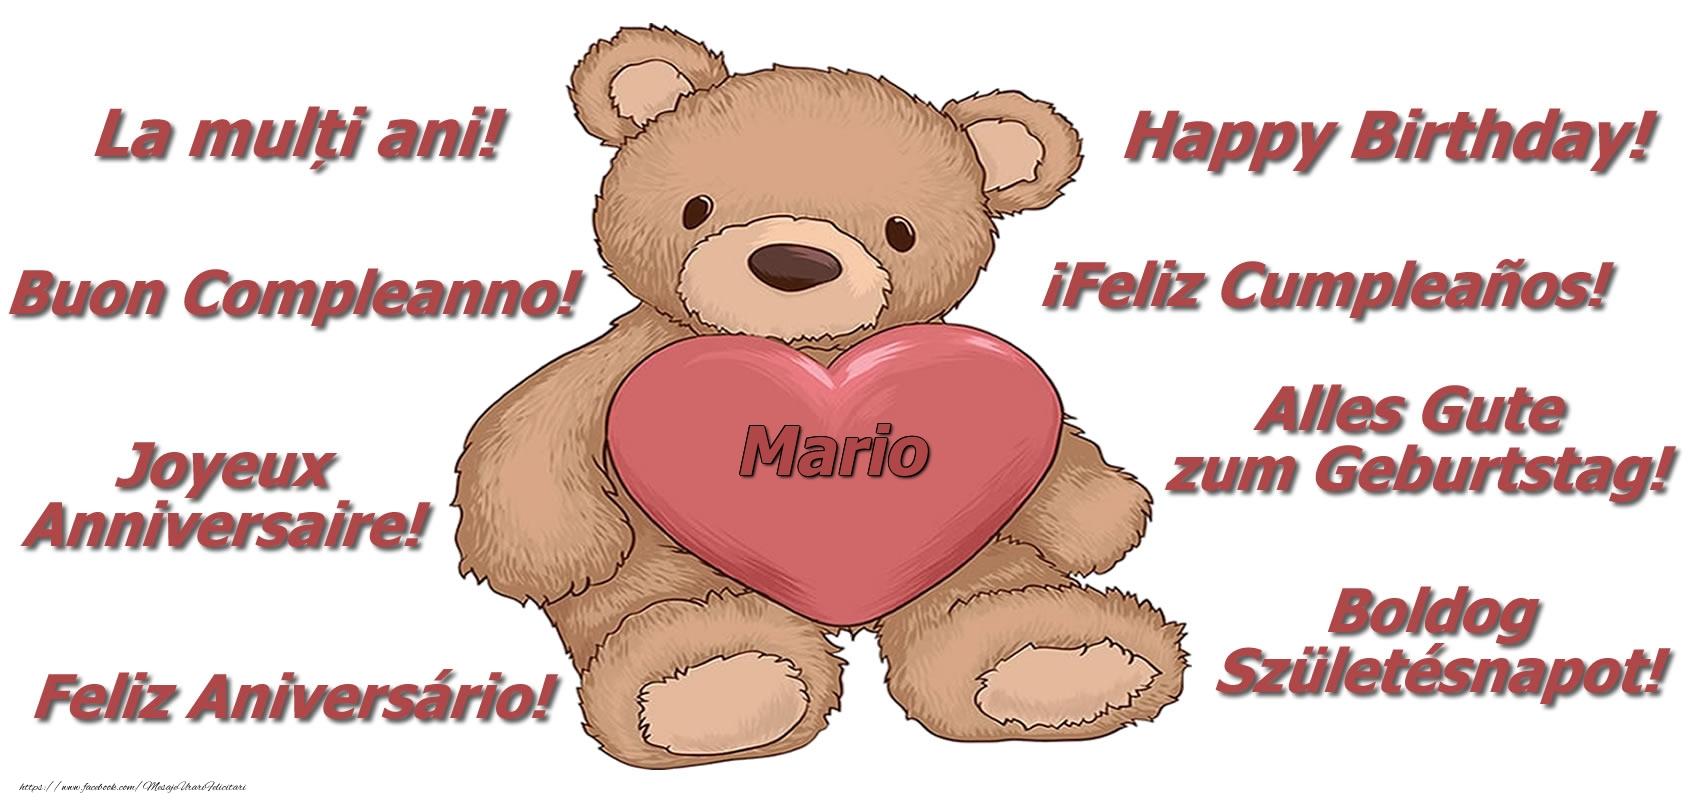 Felicitari de zi de nastere - La multi ani Mario! - Ursulet